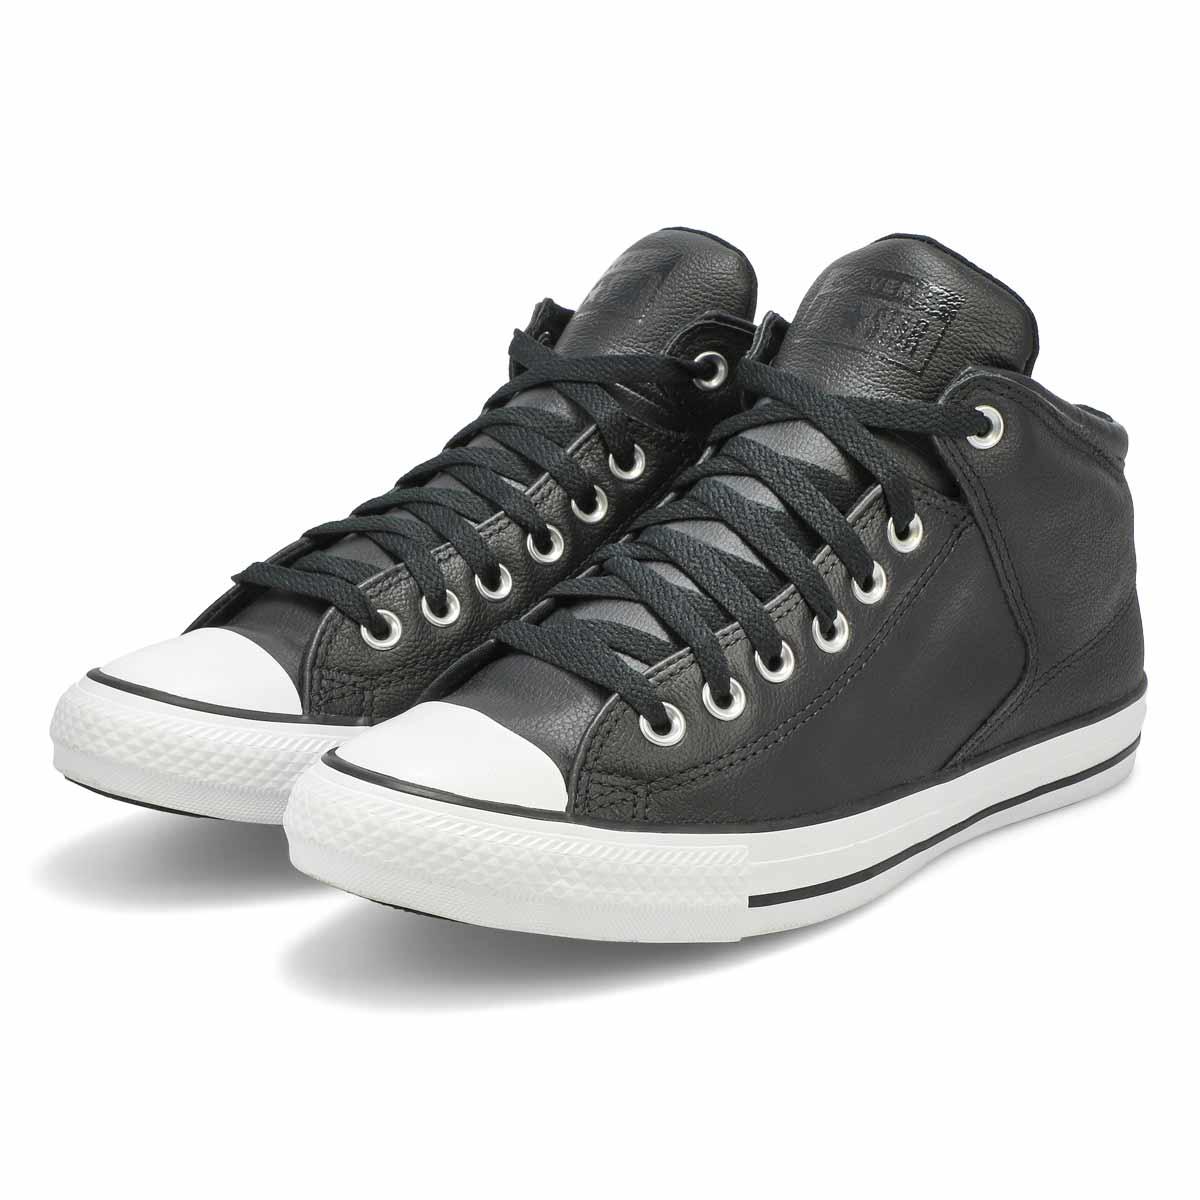 Men's All Star High Street Hi Top Leather Sneaker